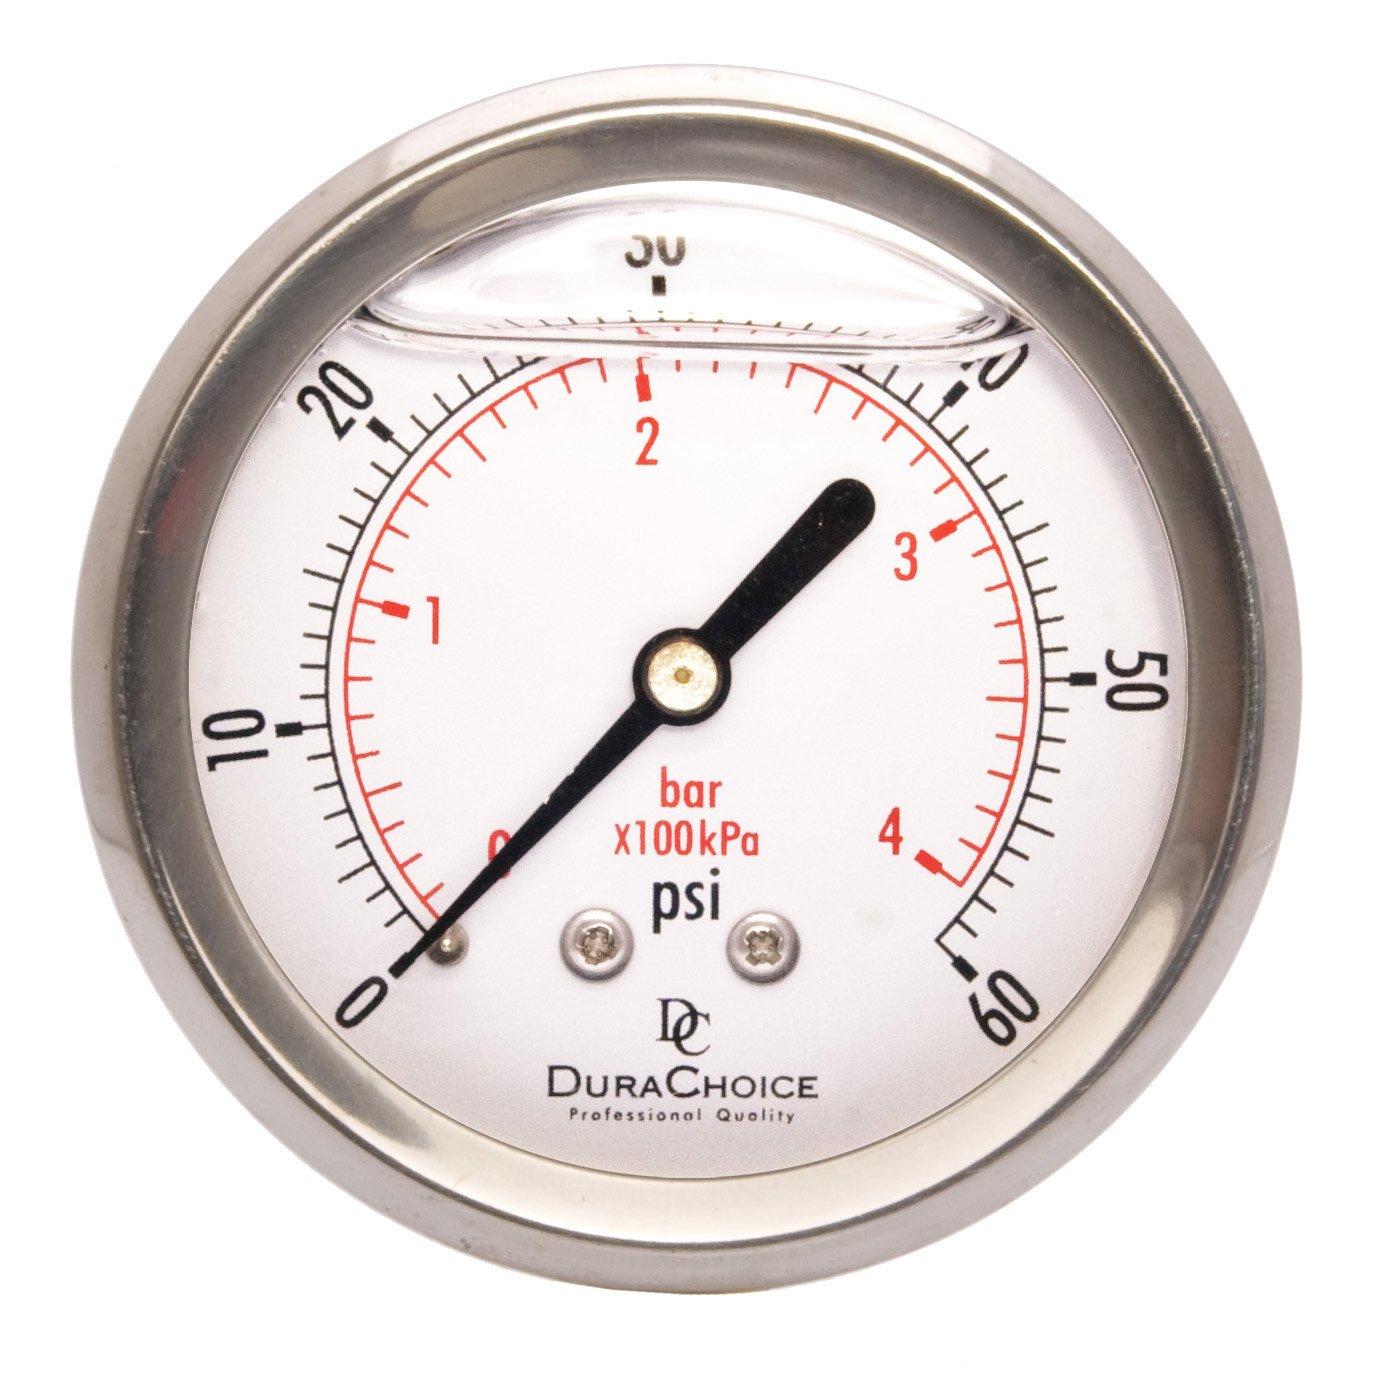 2-1/2'' Liquid Filled Pressure Gauges - Stainless Steel Case, Brass, 1/4'' NPT, Center Back Mount Connection 0-60PSI